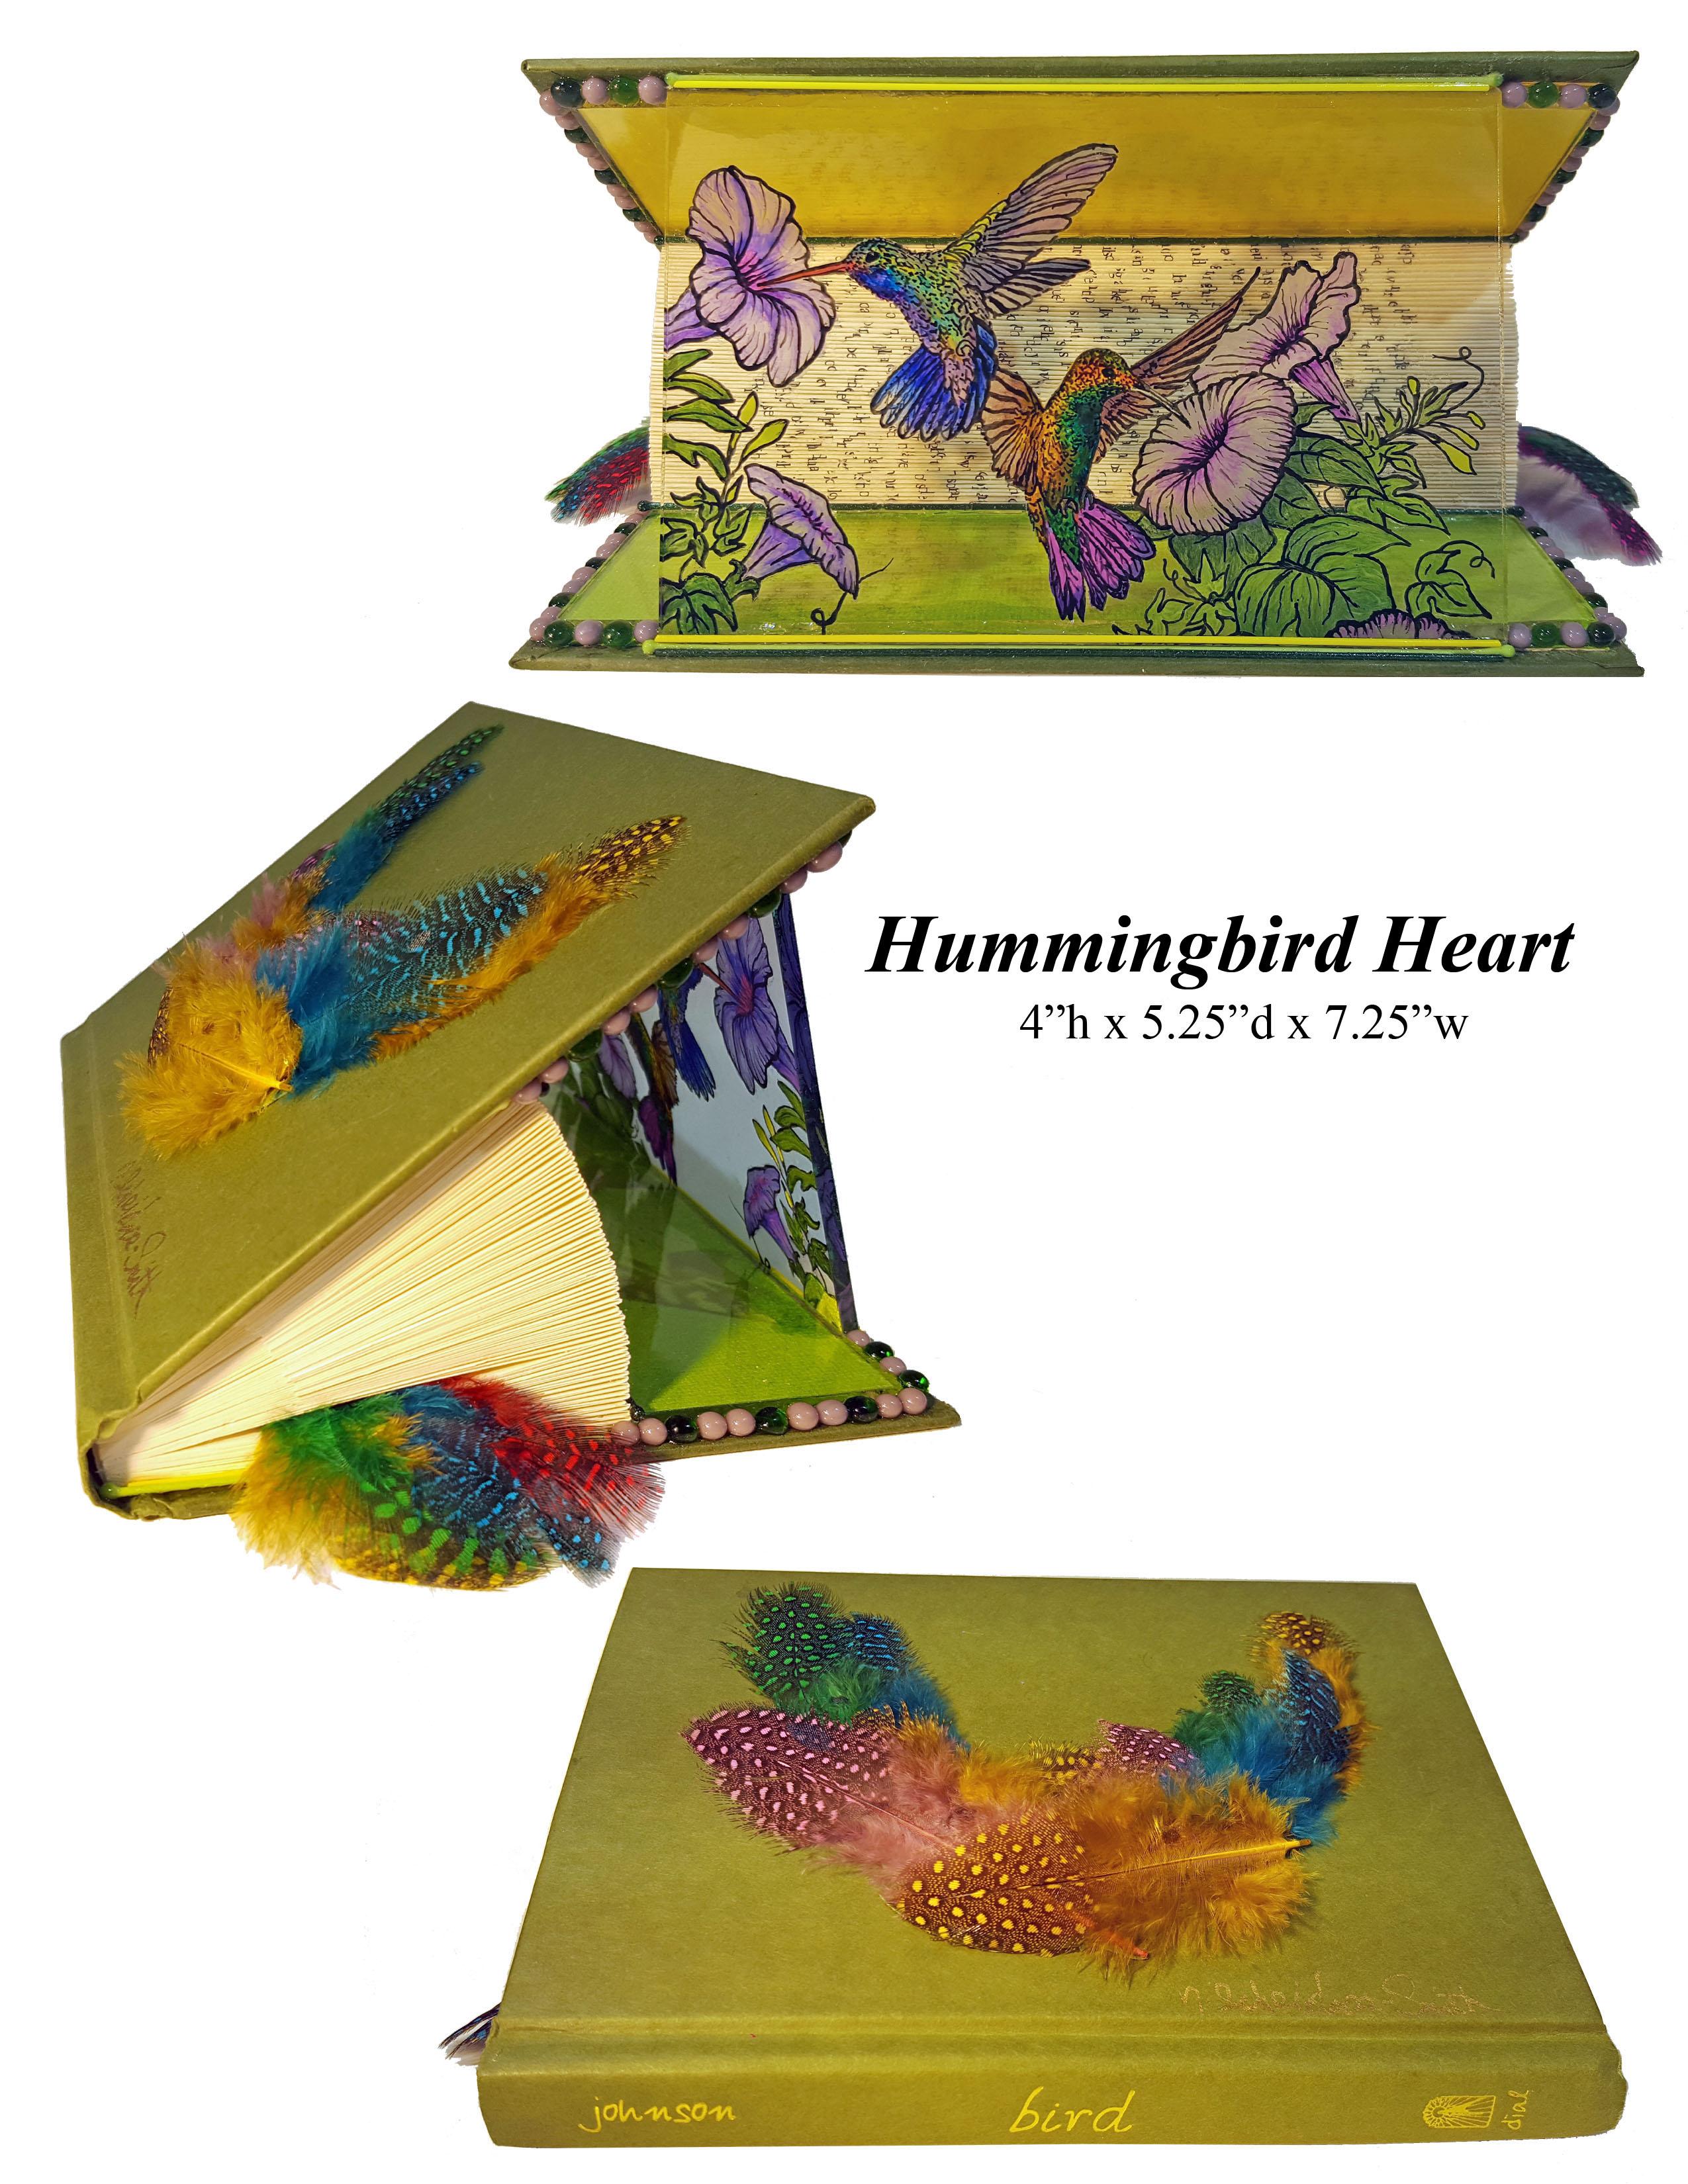 Animal Tales - Hummingbird Heart